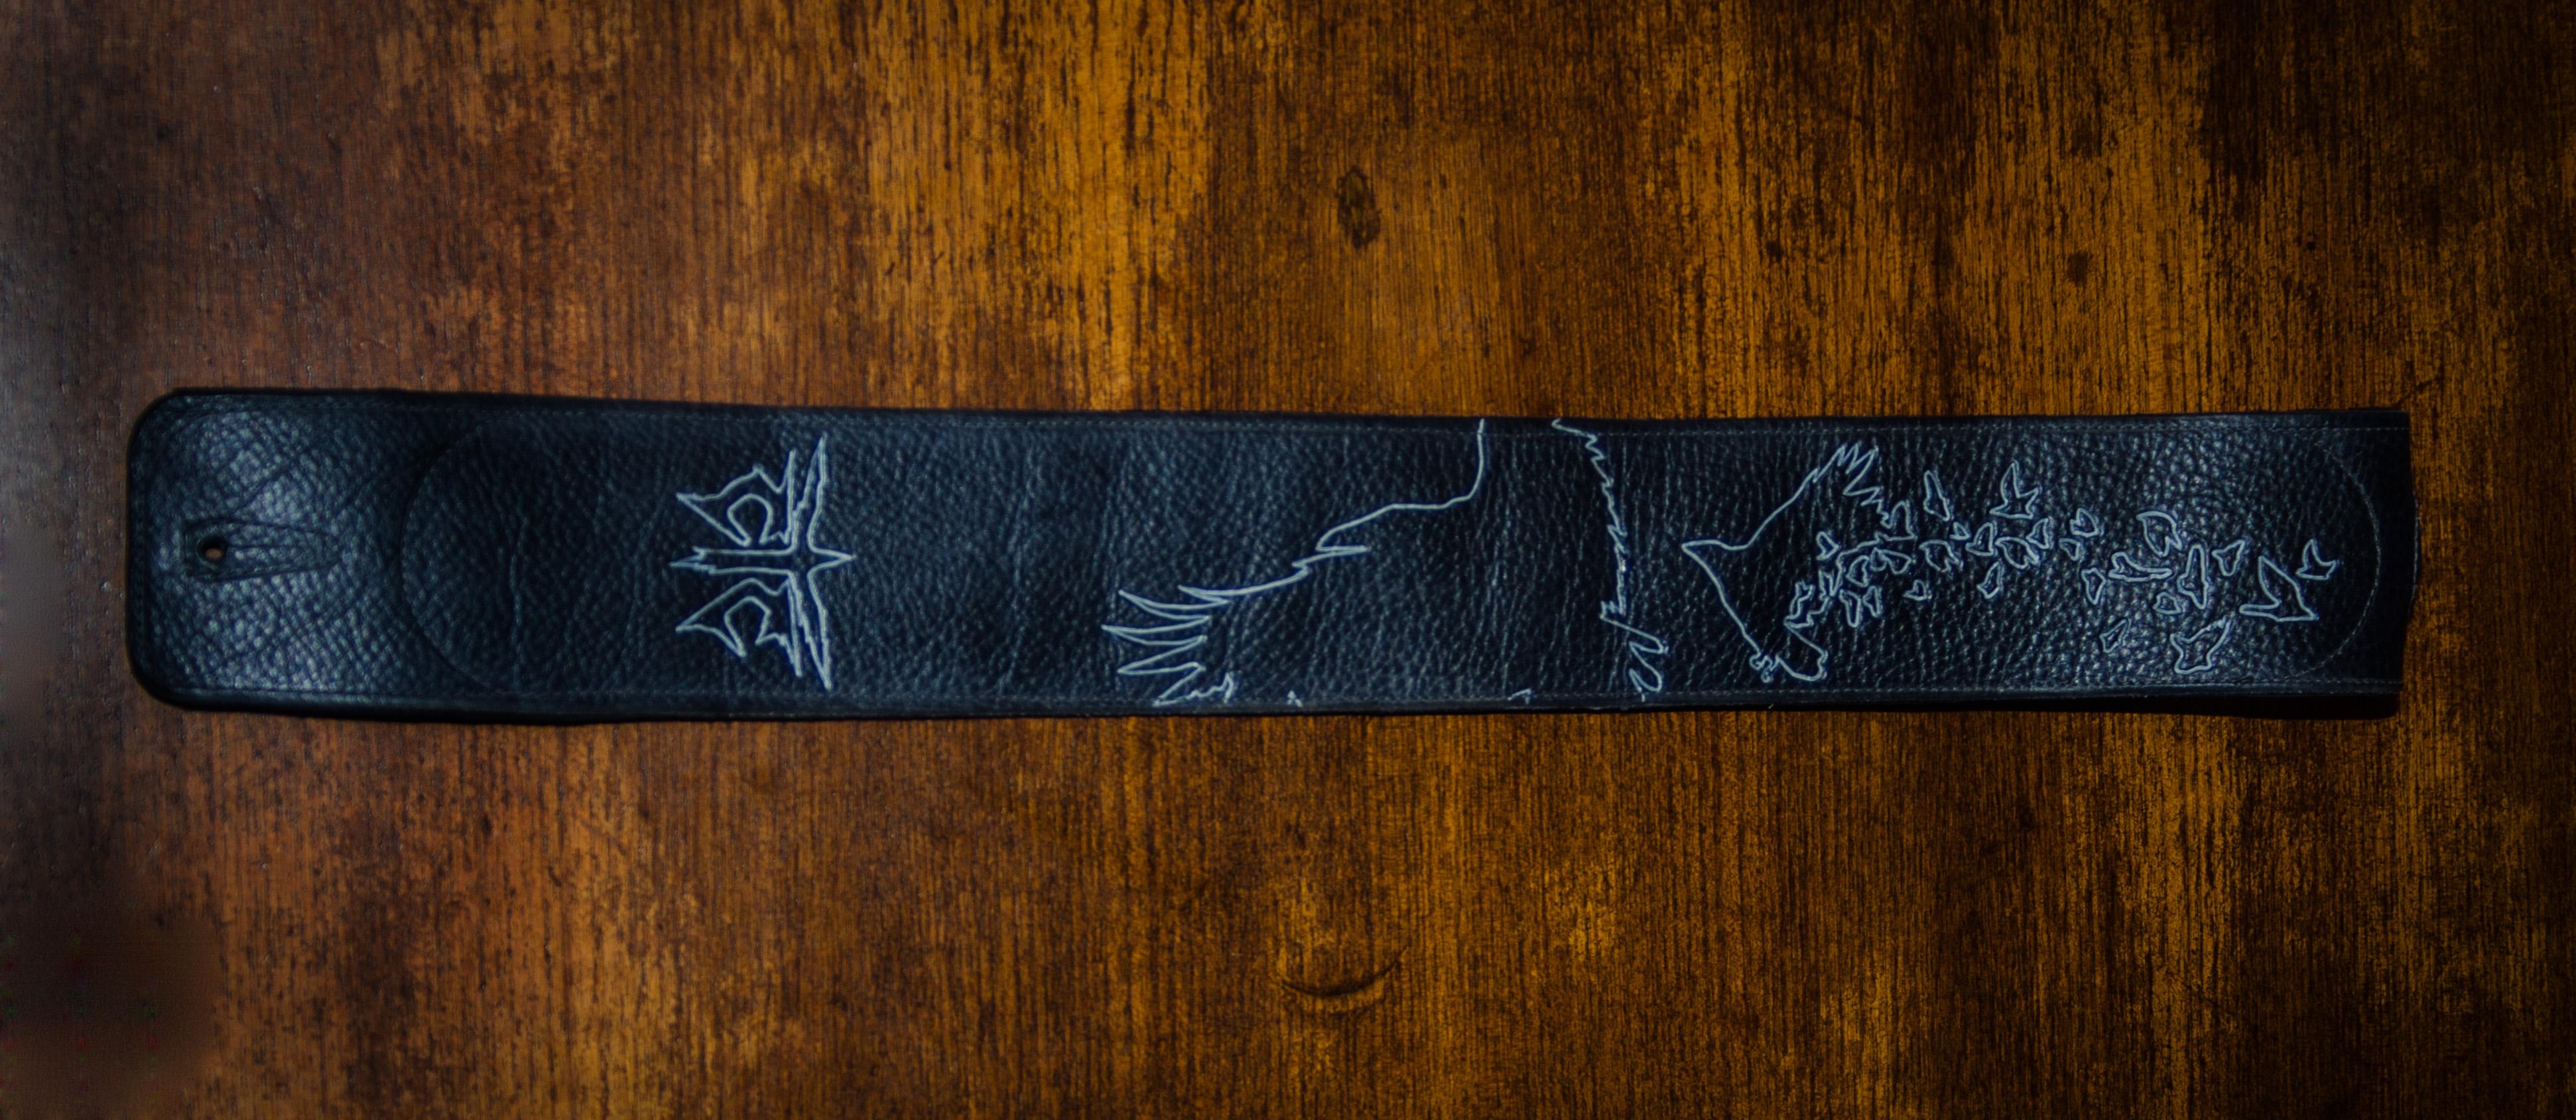 Custom Band Strap - Black